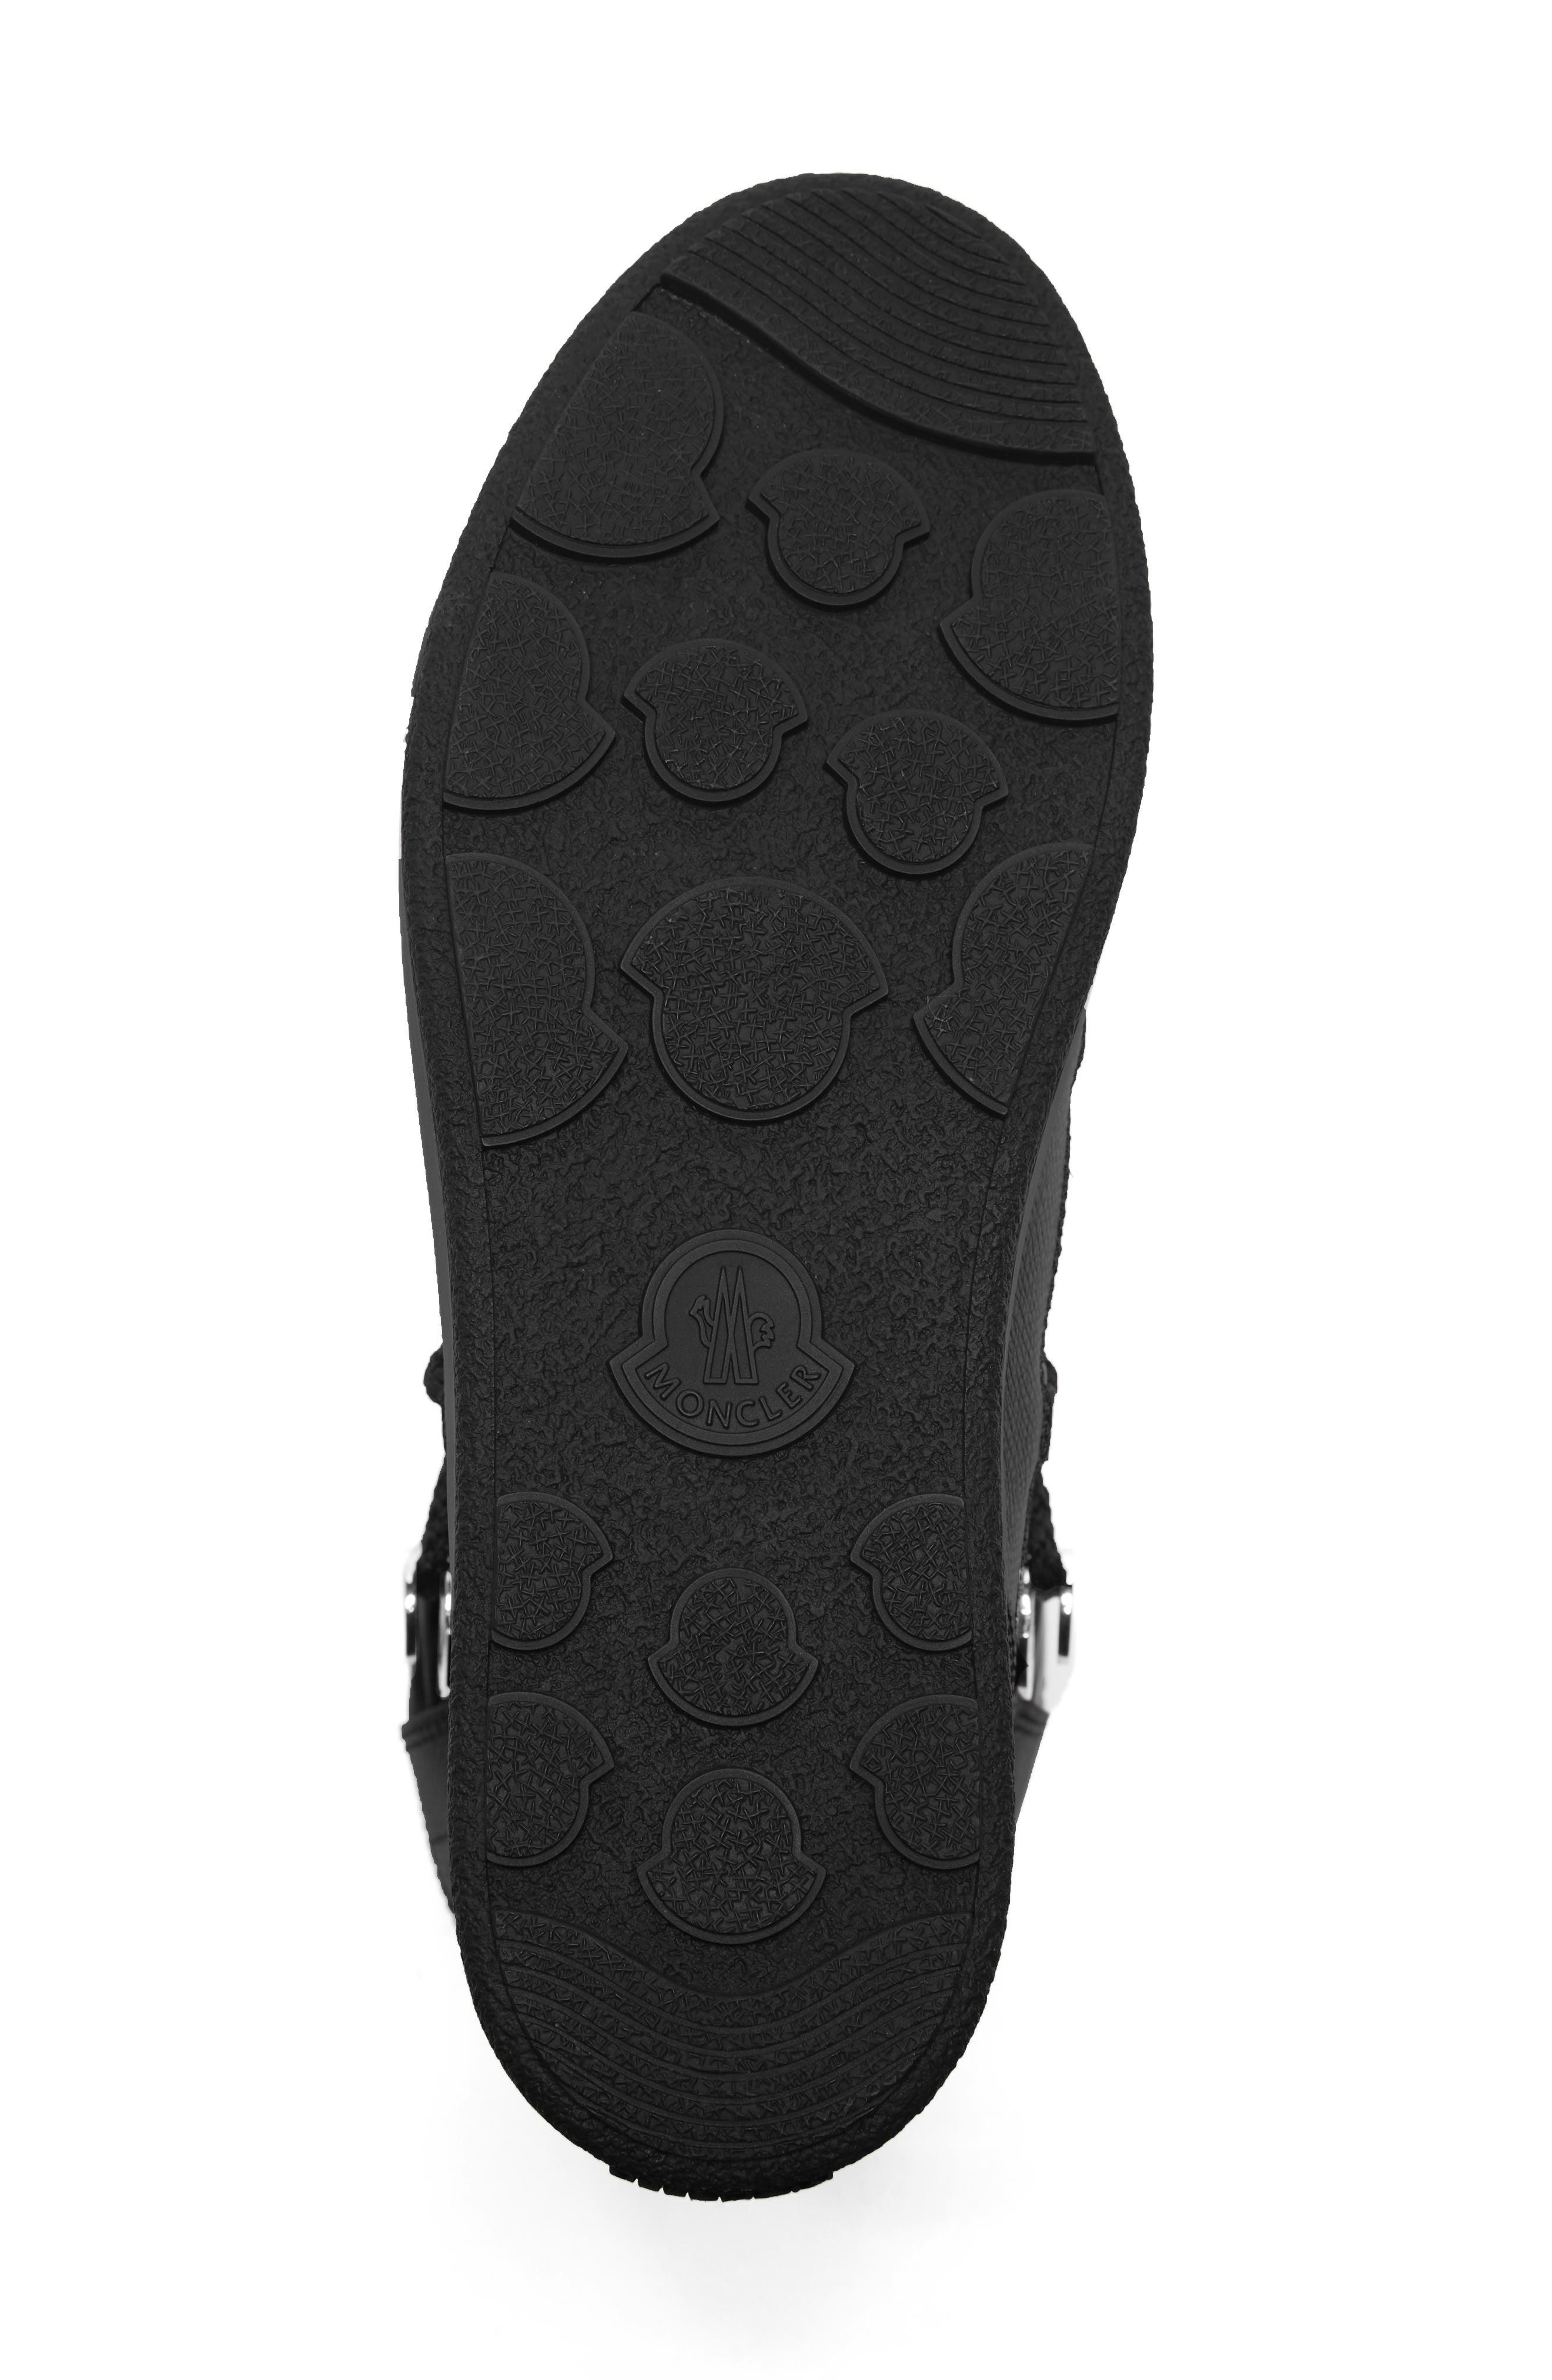 New Fanny Stivale Short Boots,                             Alternate thumbnail 6, color,                             001